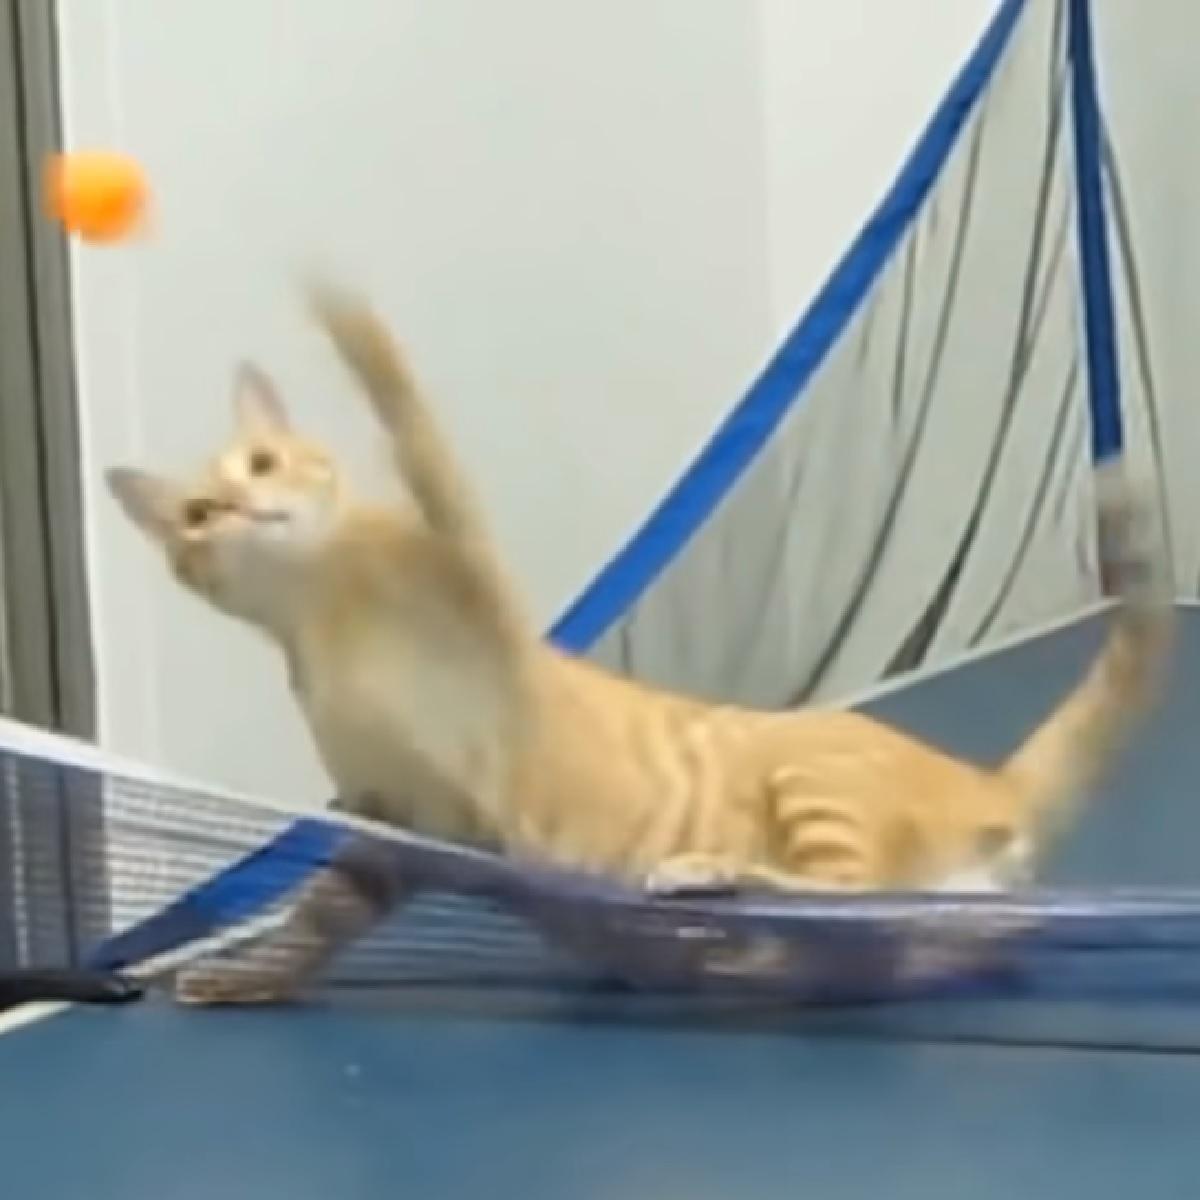 nadi gatto talento puro ping pong